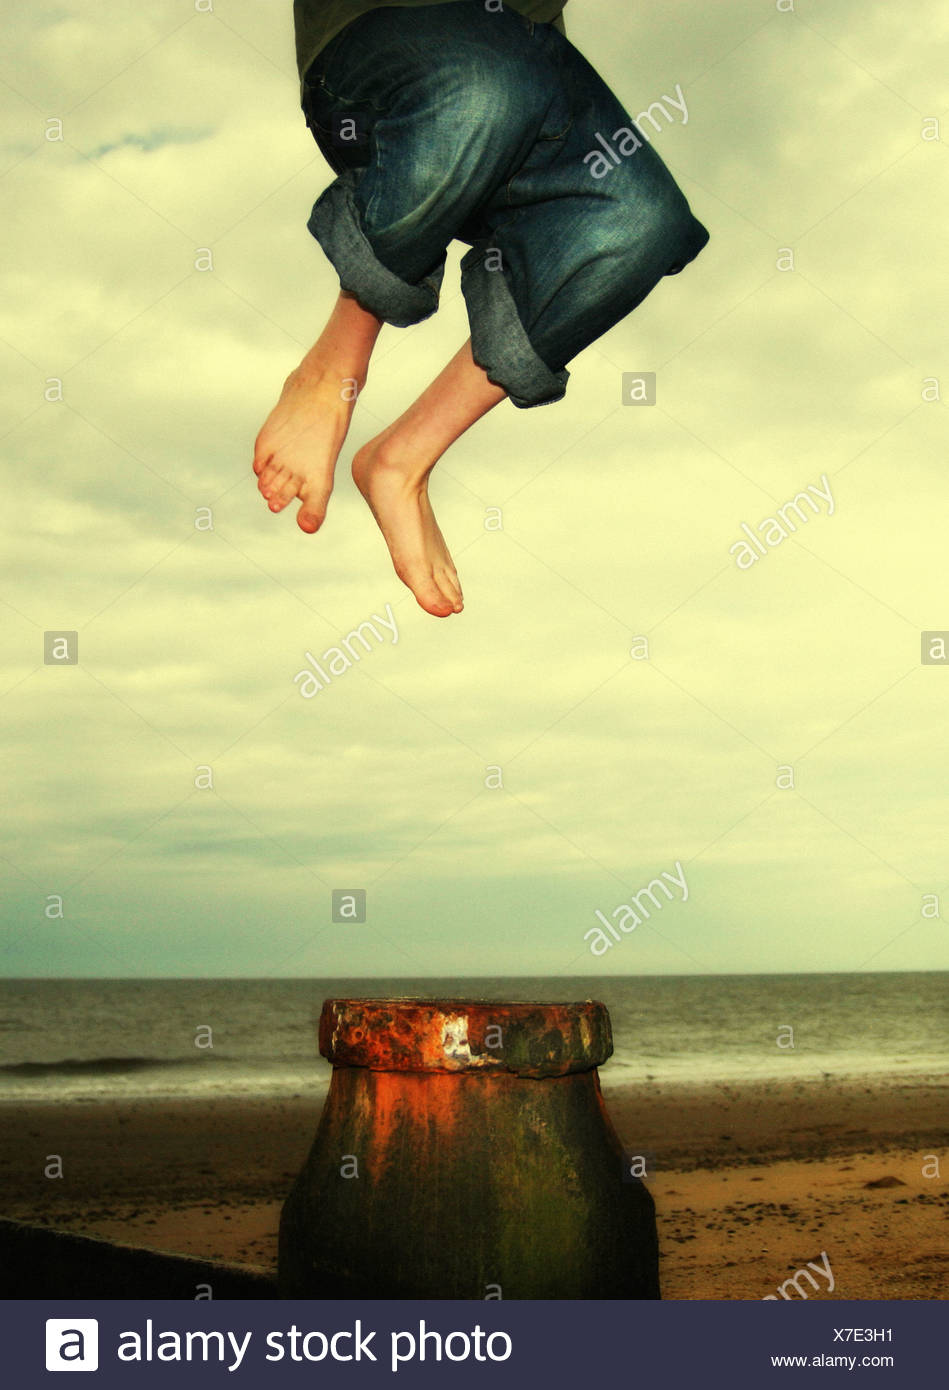 jump 4 - Stock Image